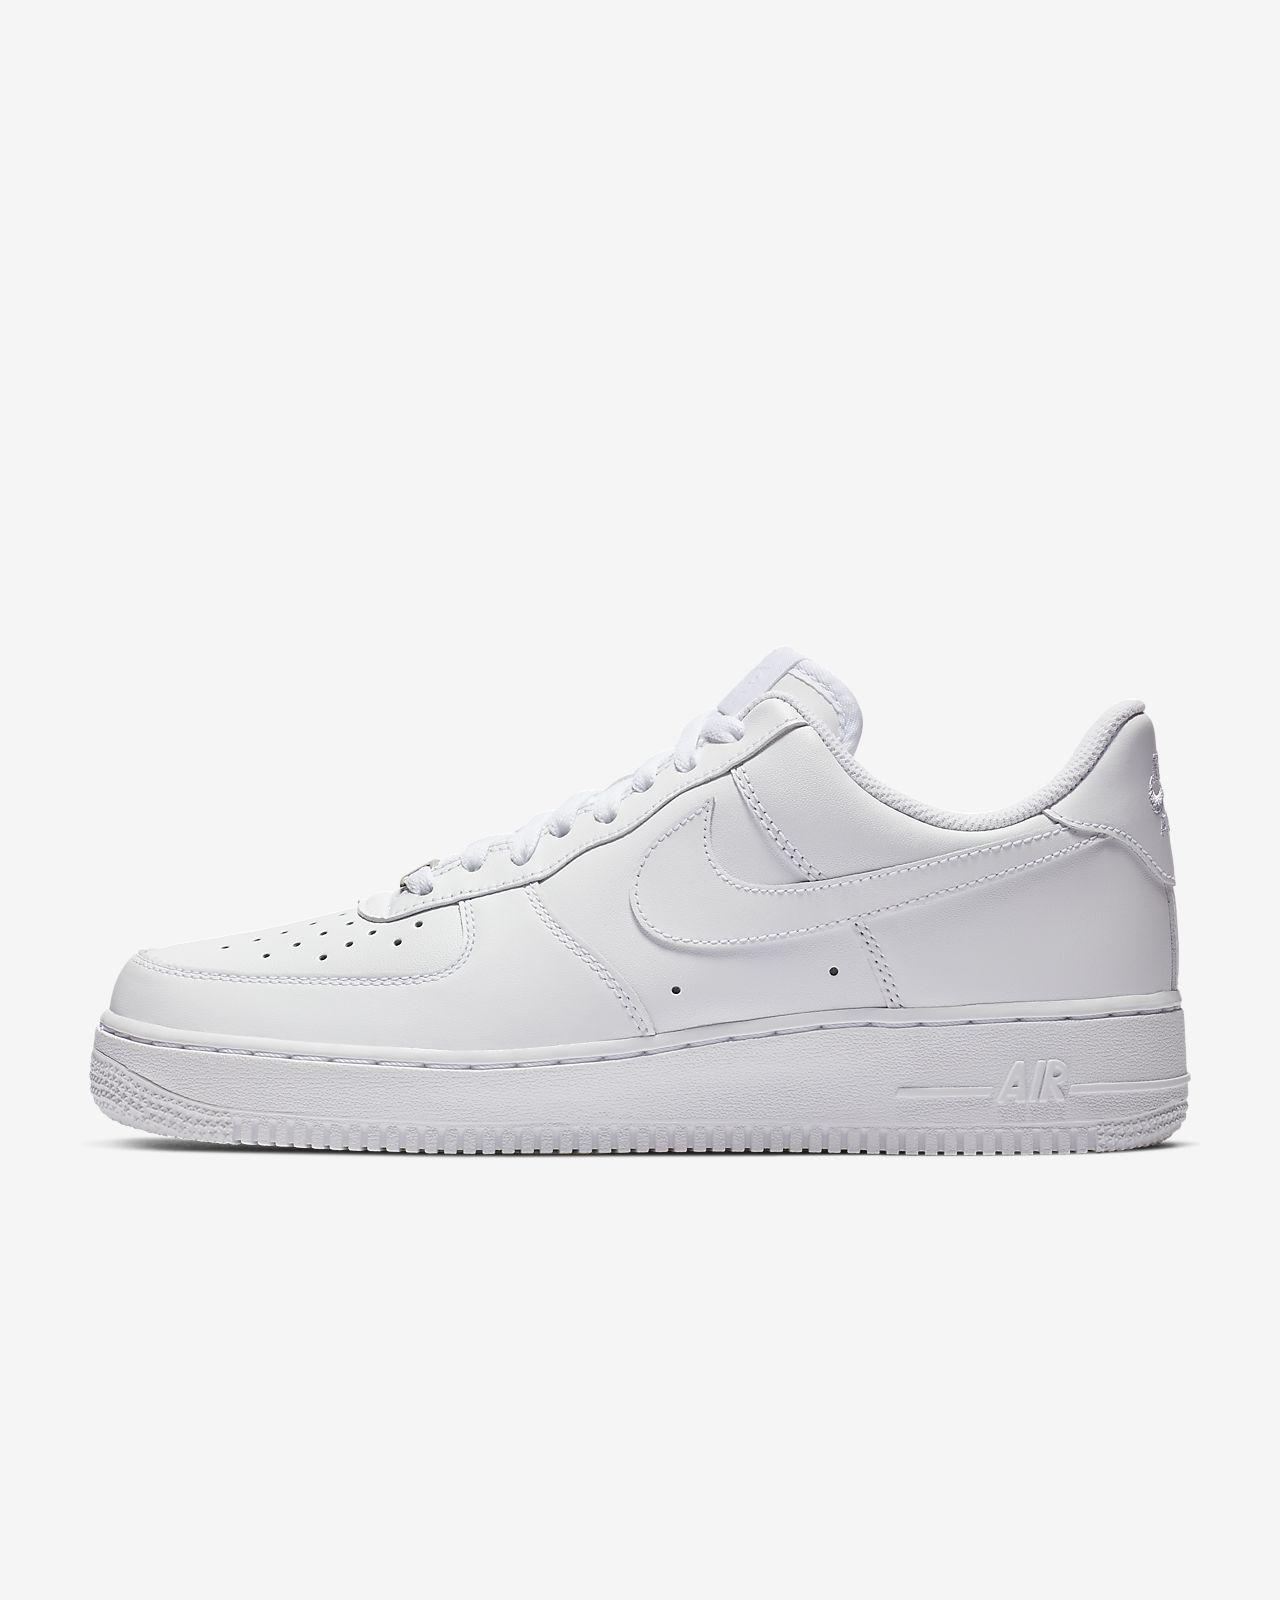 Chaussure Nike Air Force 1 '07 Triple White pour Femme